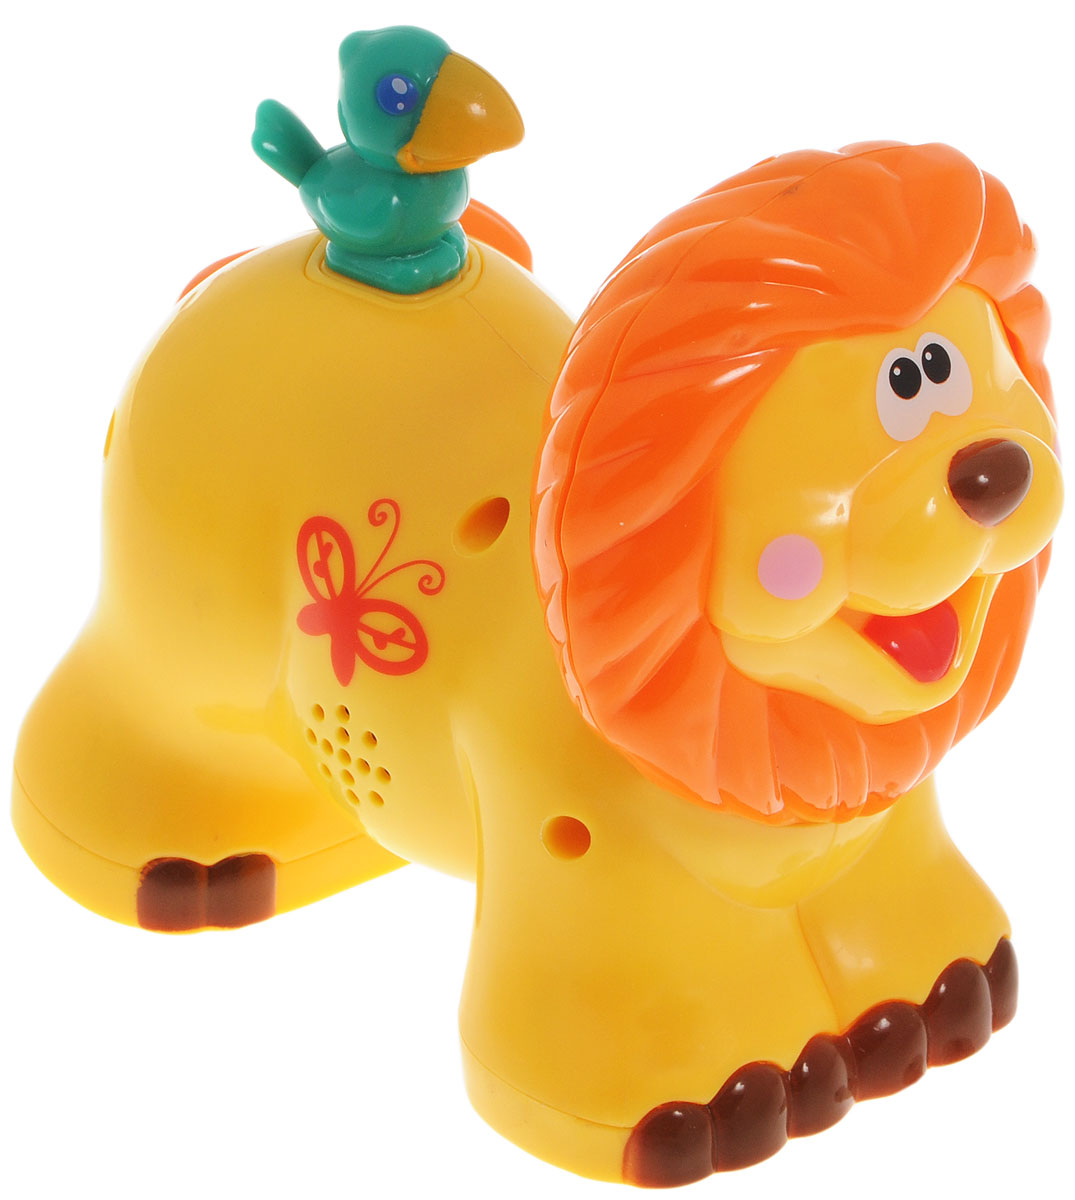 Kiddieland Развивающая игрушка-каталка Лев kiddieland развивающая игрушка каталка слоник